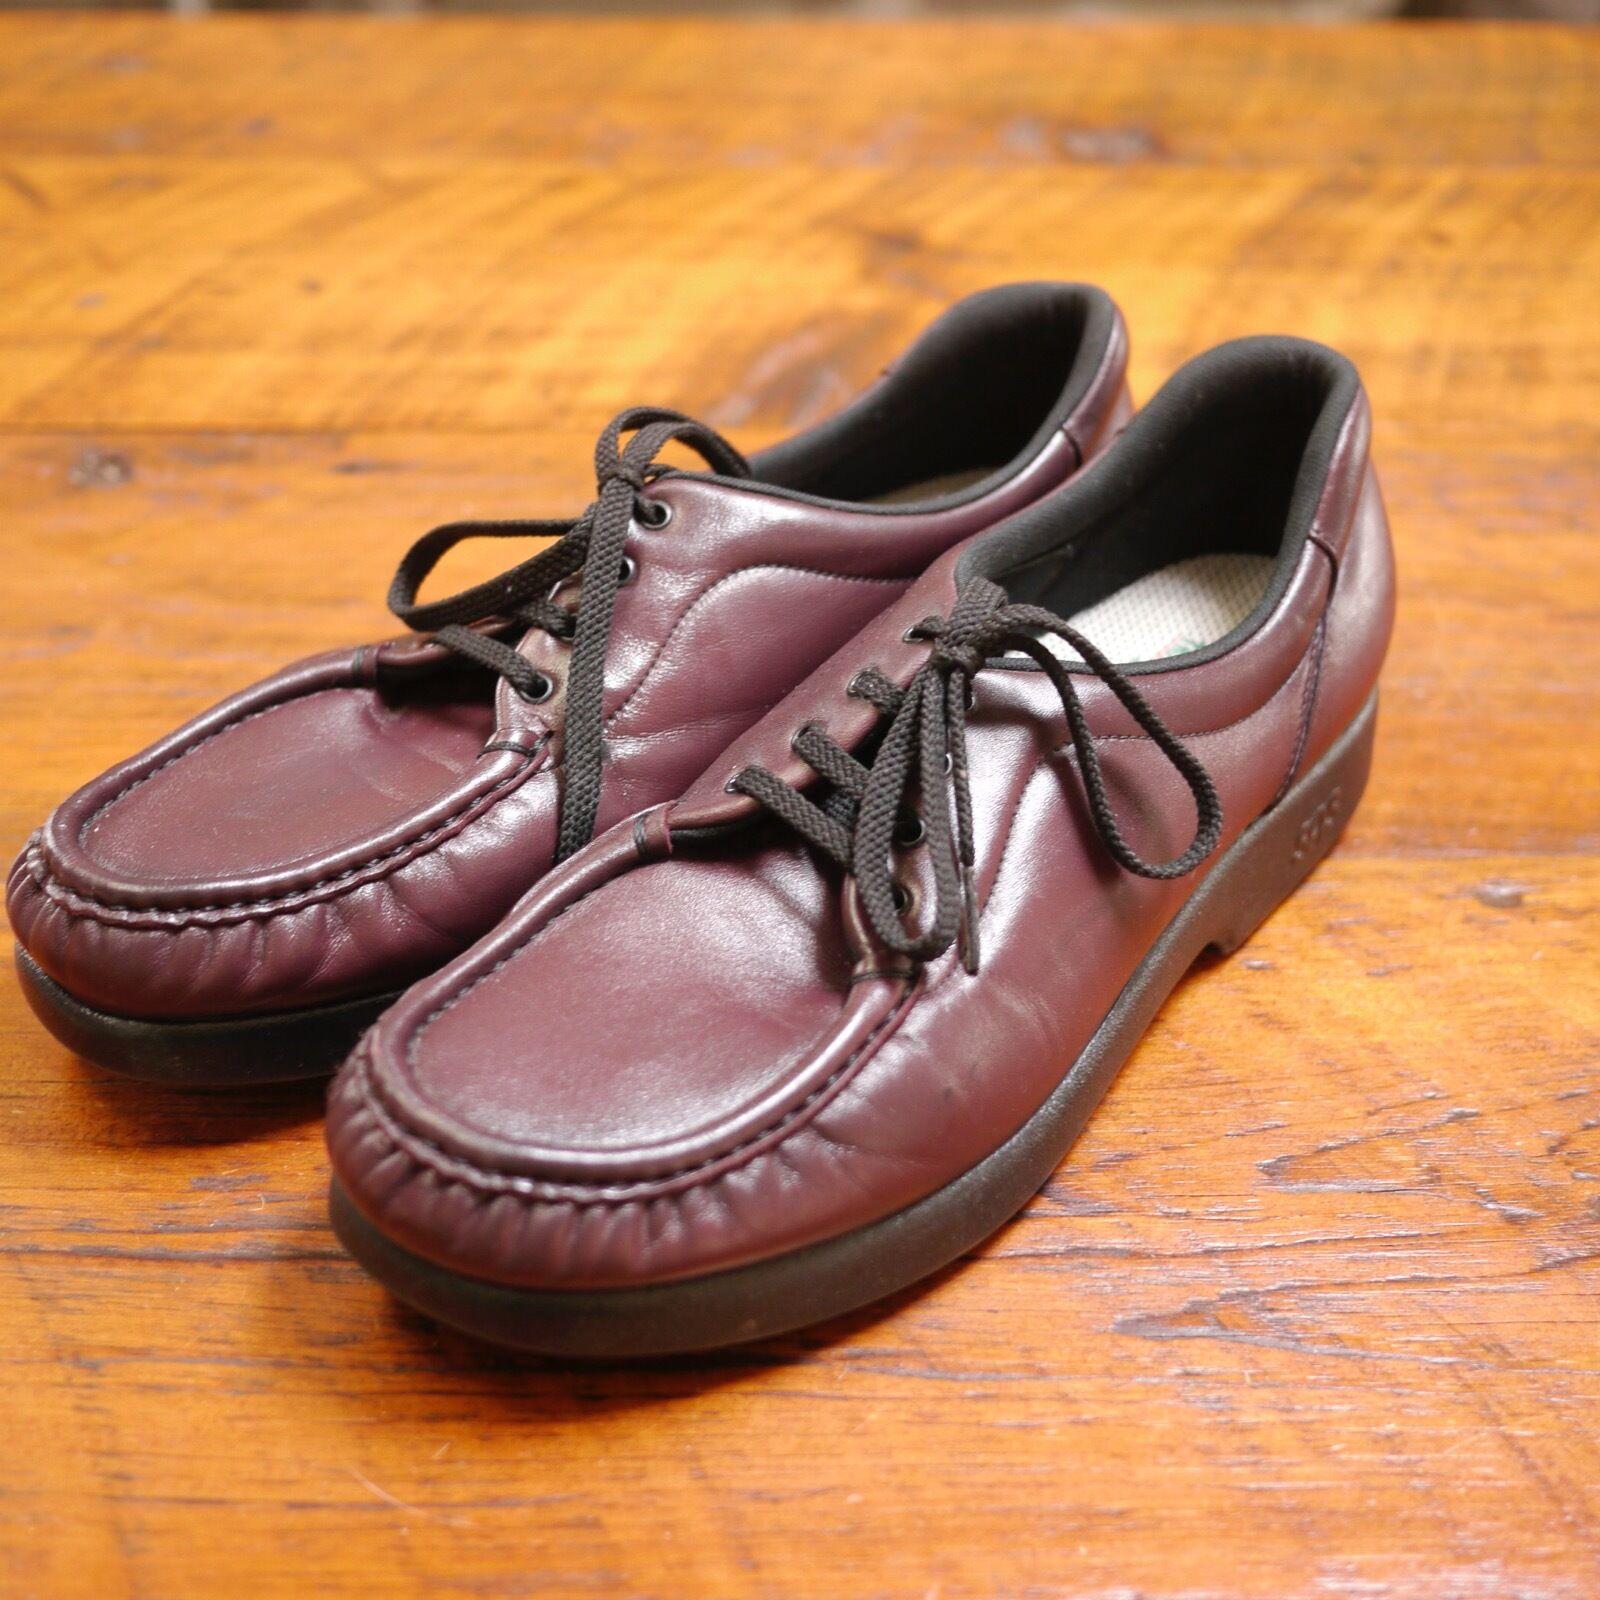 WOMENS Take Time SAS Tripad Comfort Burgundy Leather USA shoes 11.5 42.5